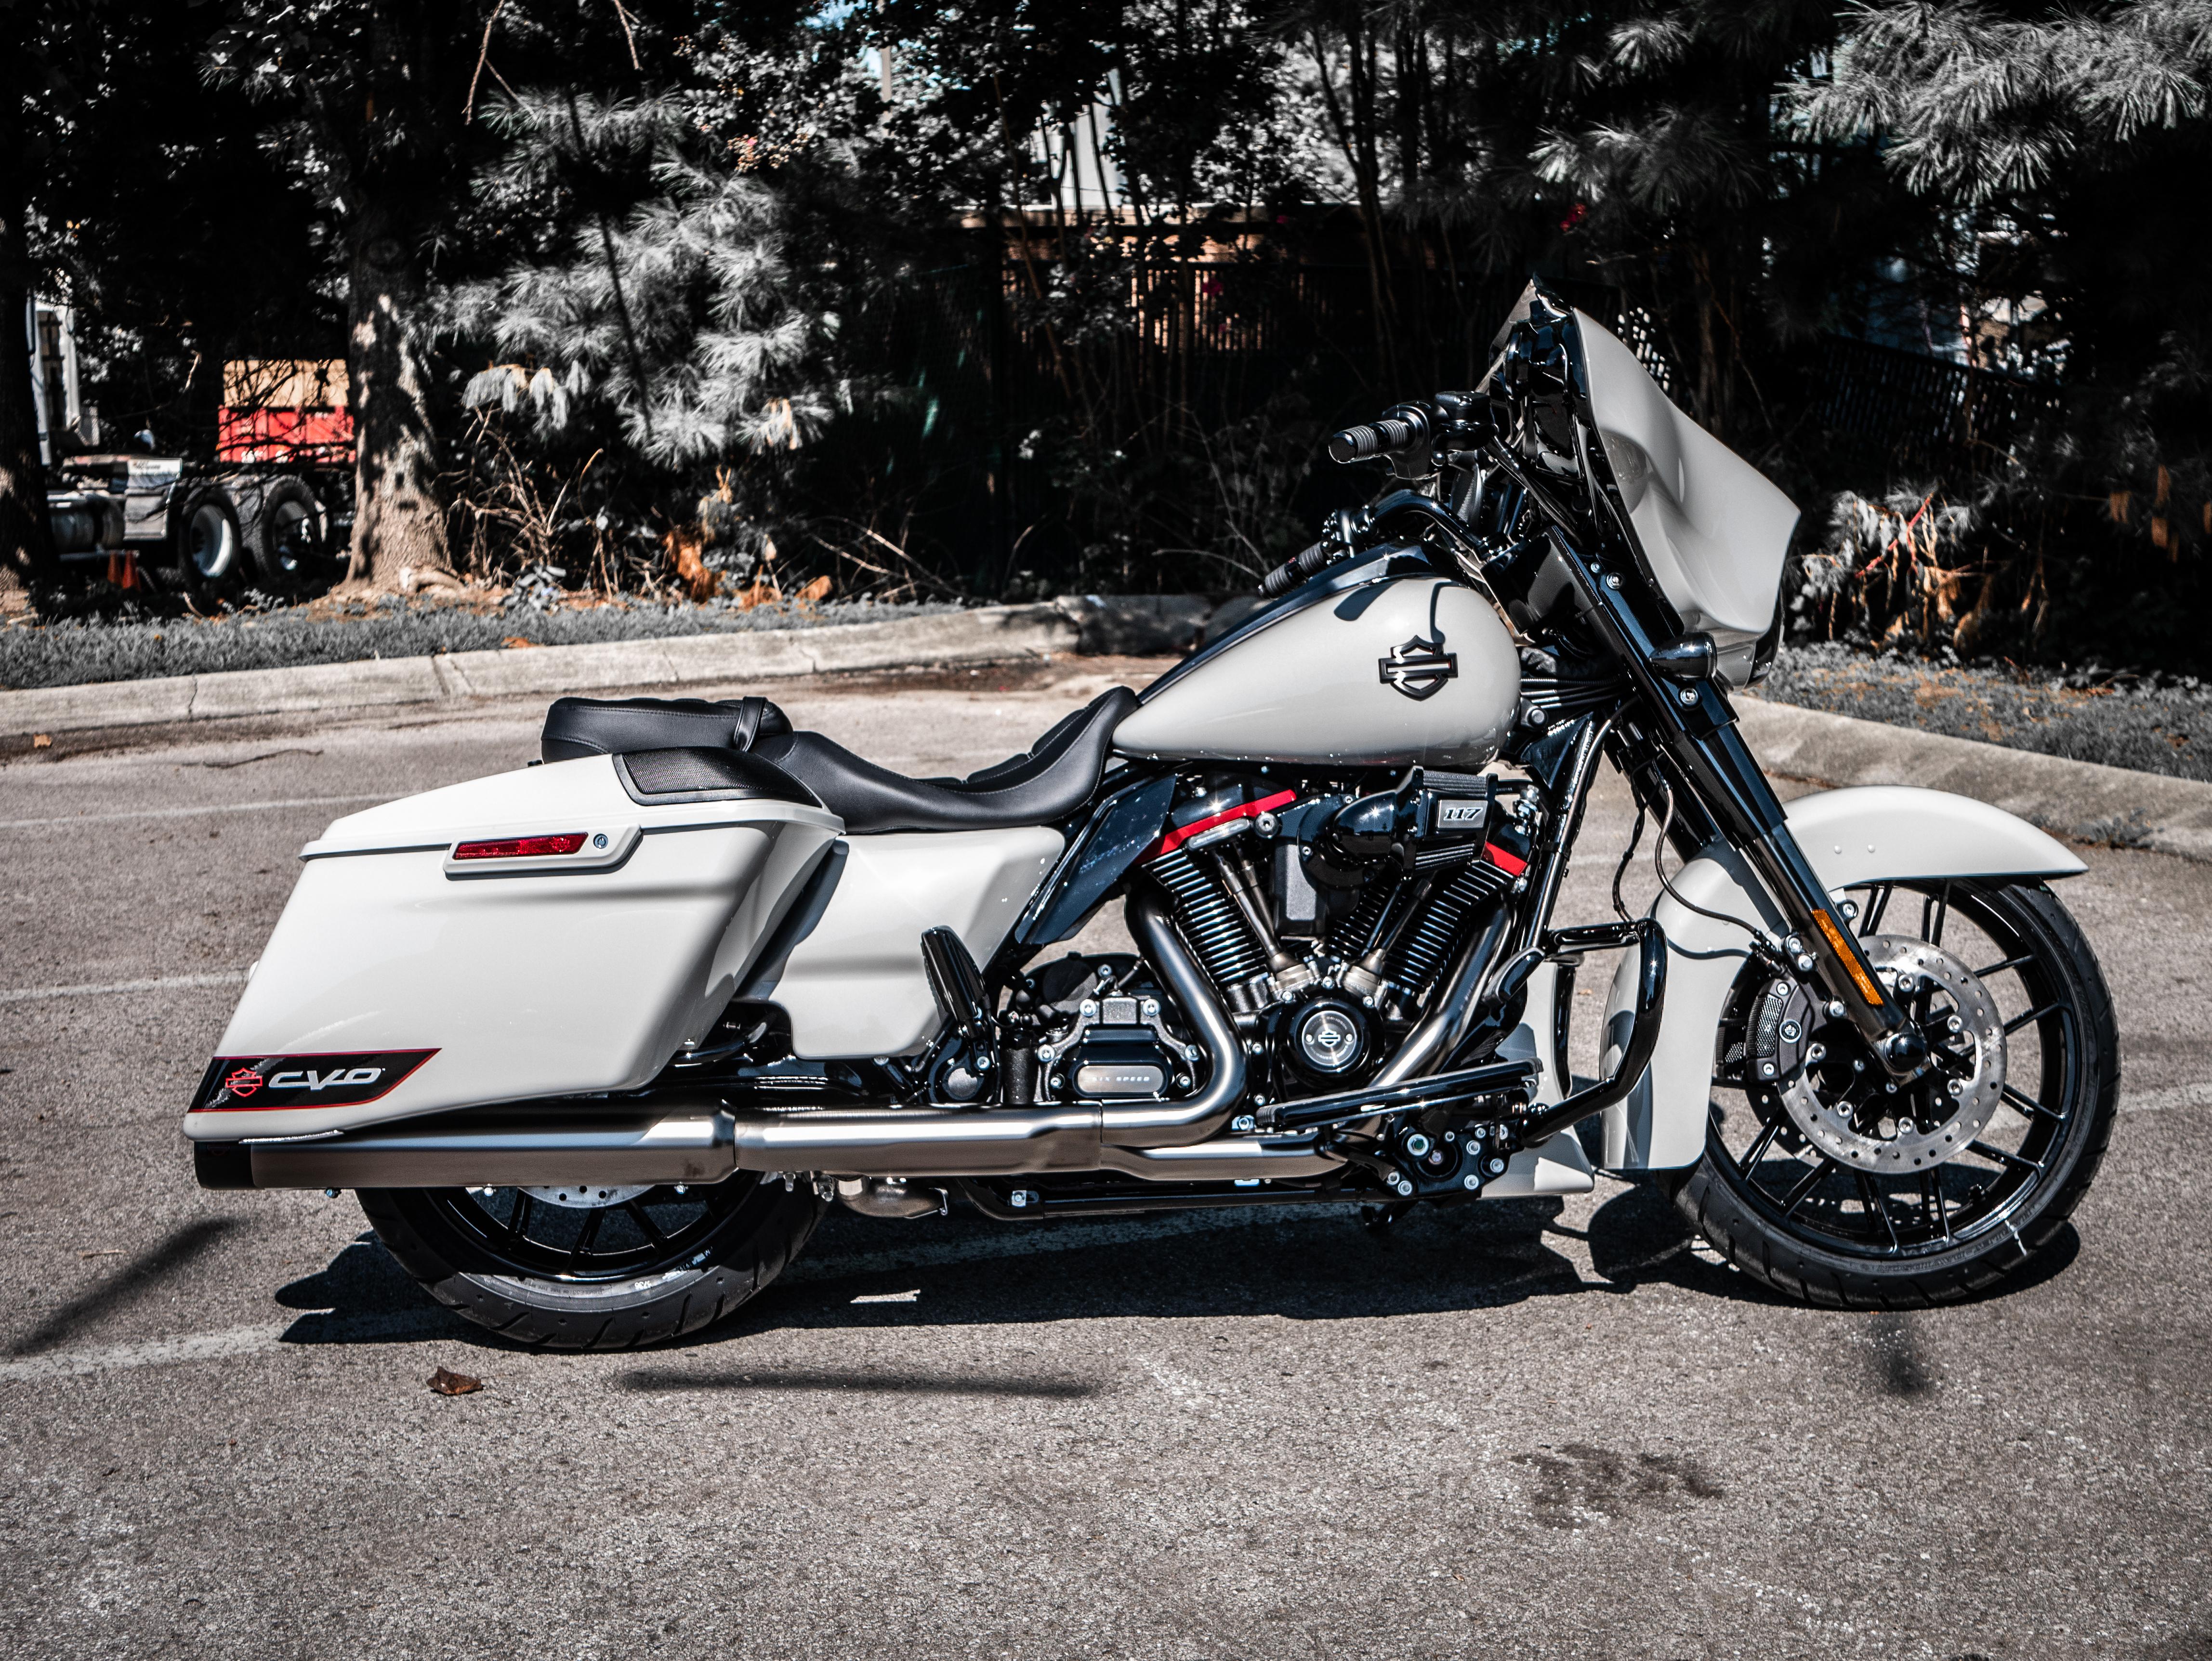 New 2020 Harley-Davidson CVO Street Glide in Franklin # ...